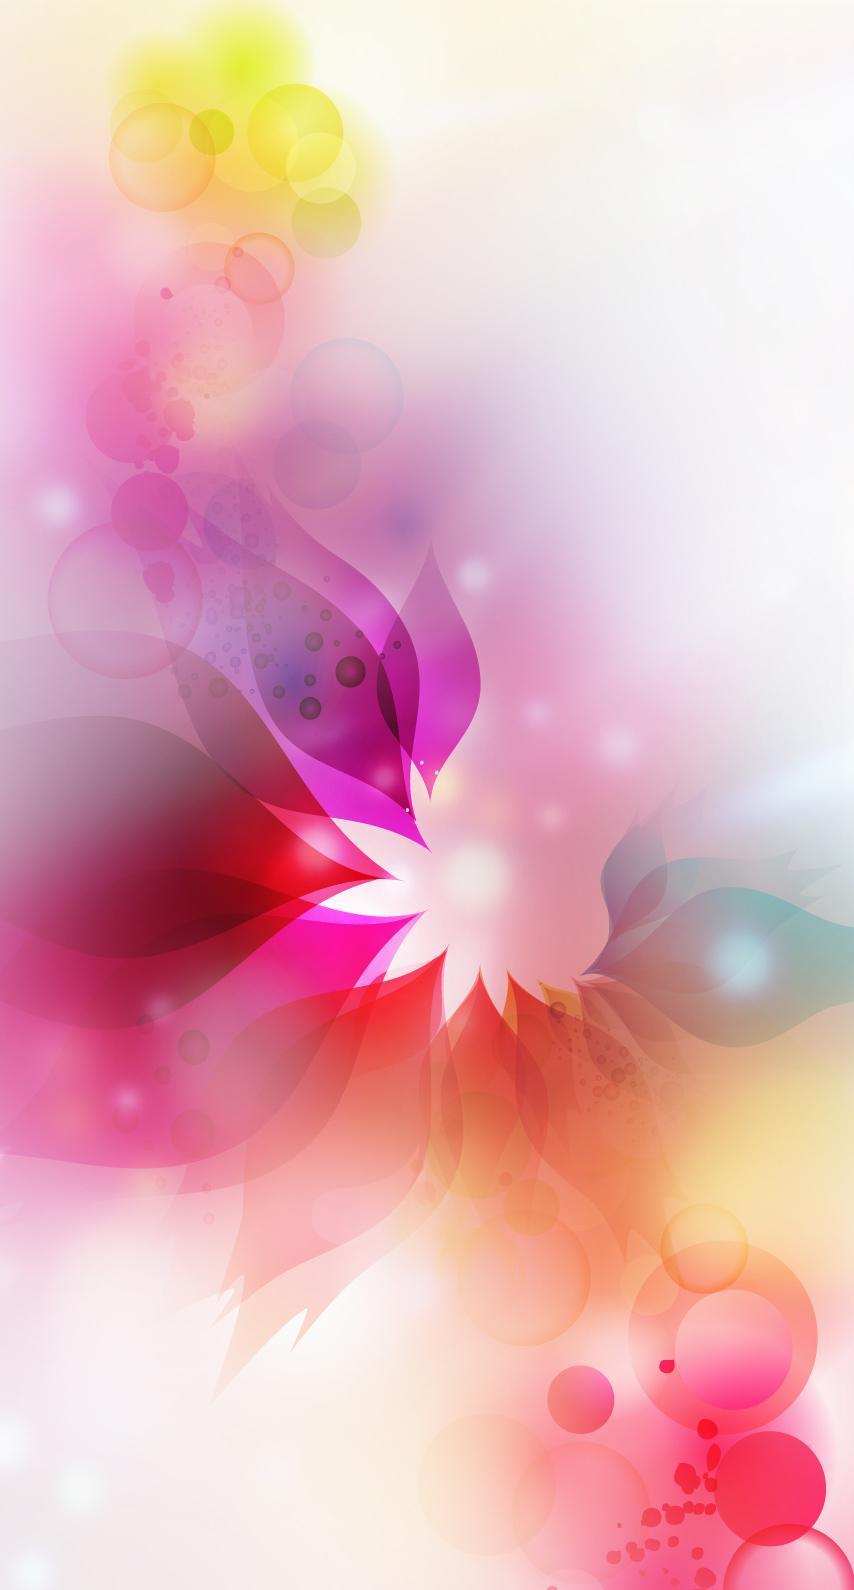 blur, luminescence